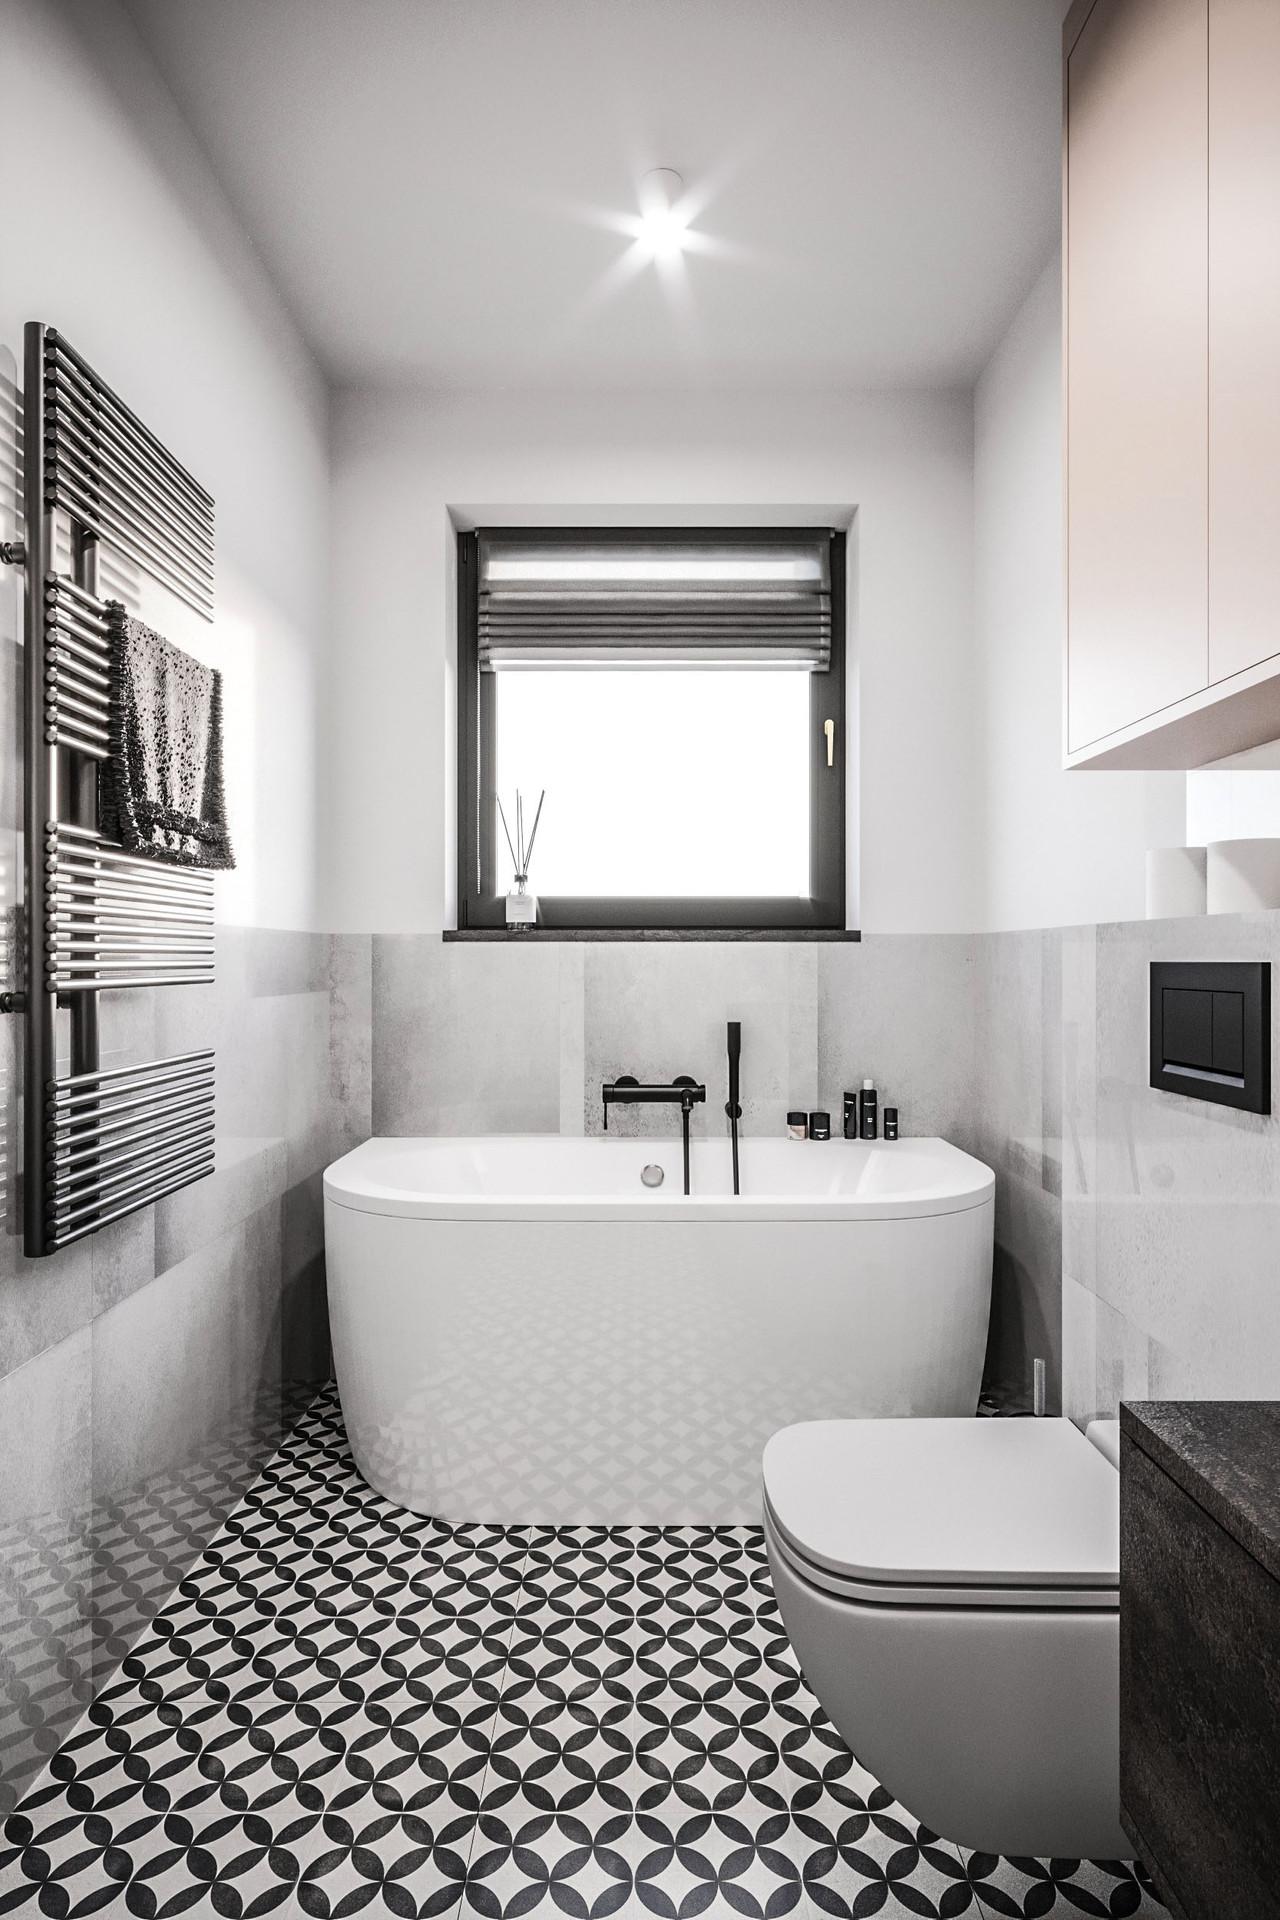 Bathroom with a loft touch